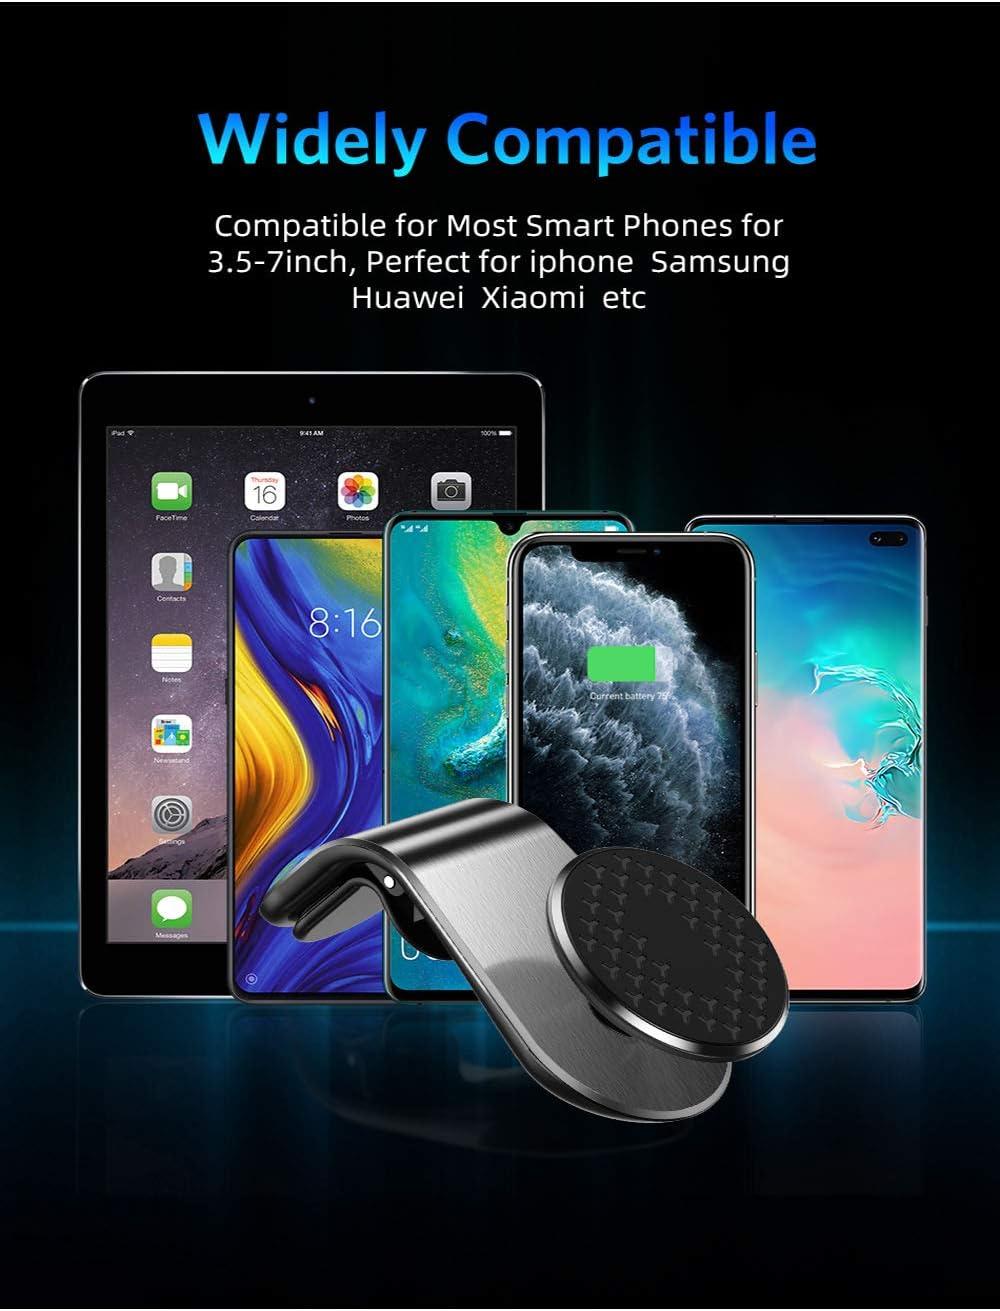 Smartphone Plateado Jahubo Soporte M/óvil Coche Magn/ético Universal 360/° para Rejillas Aire Coche Iman para iPhone XS//XS MAX//XR//X 8//8 Dispositivo GPS y Etc,Mini Im/án M/óvil Coche Xiaomi